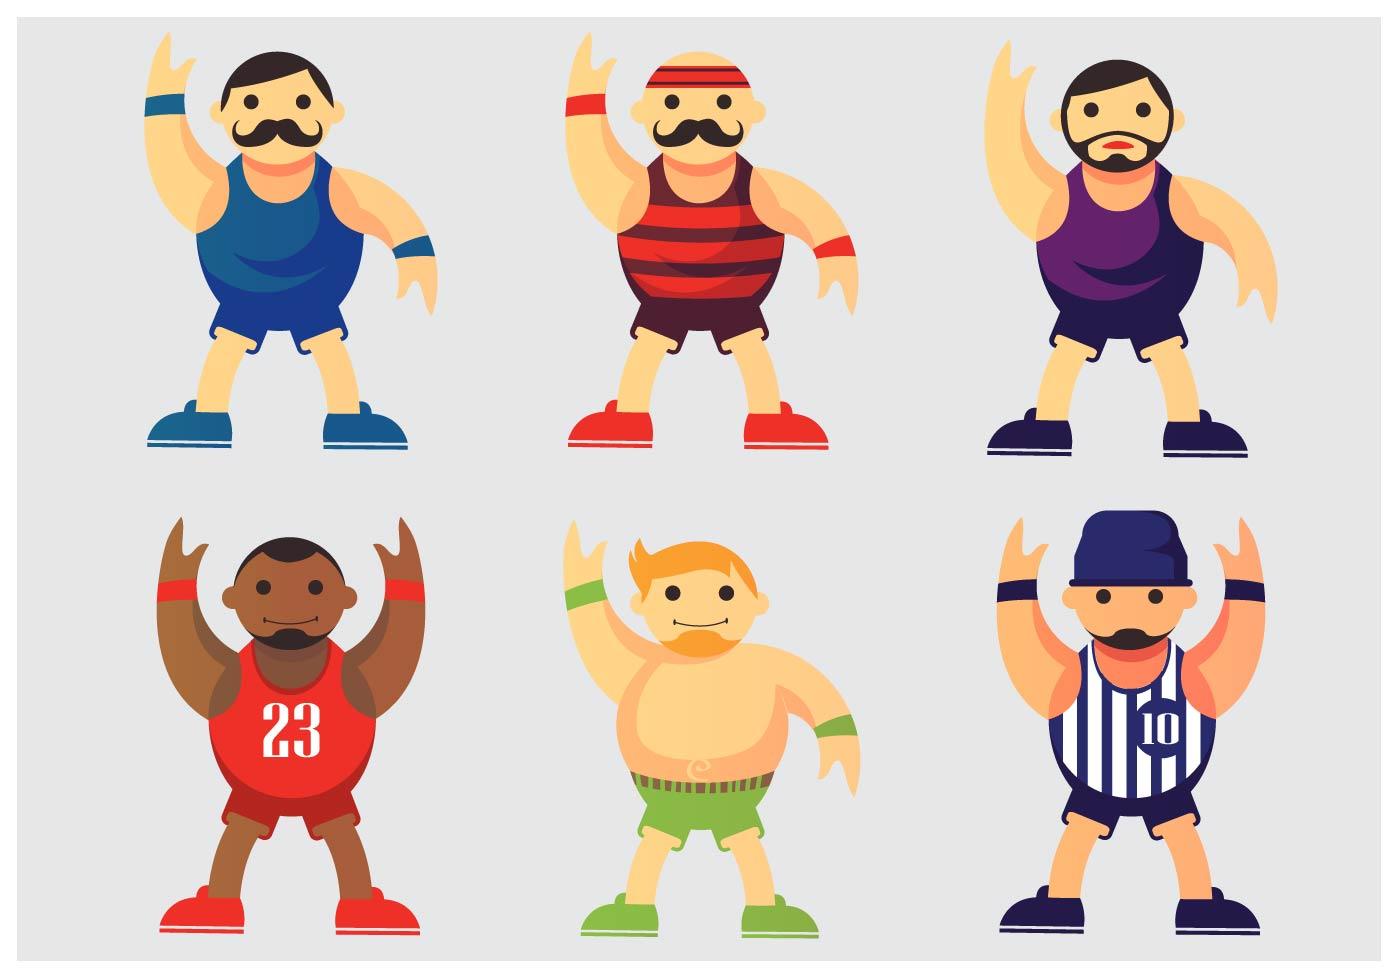 Fat Guy Vectors - Download Free Vector Art, Stock Graphics ...